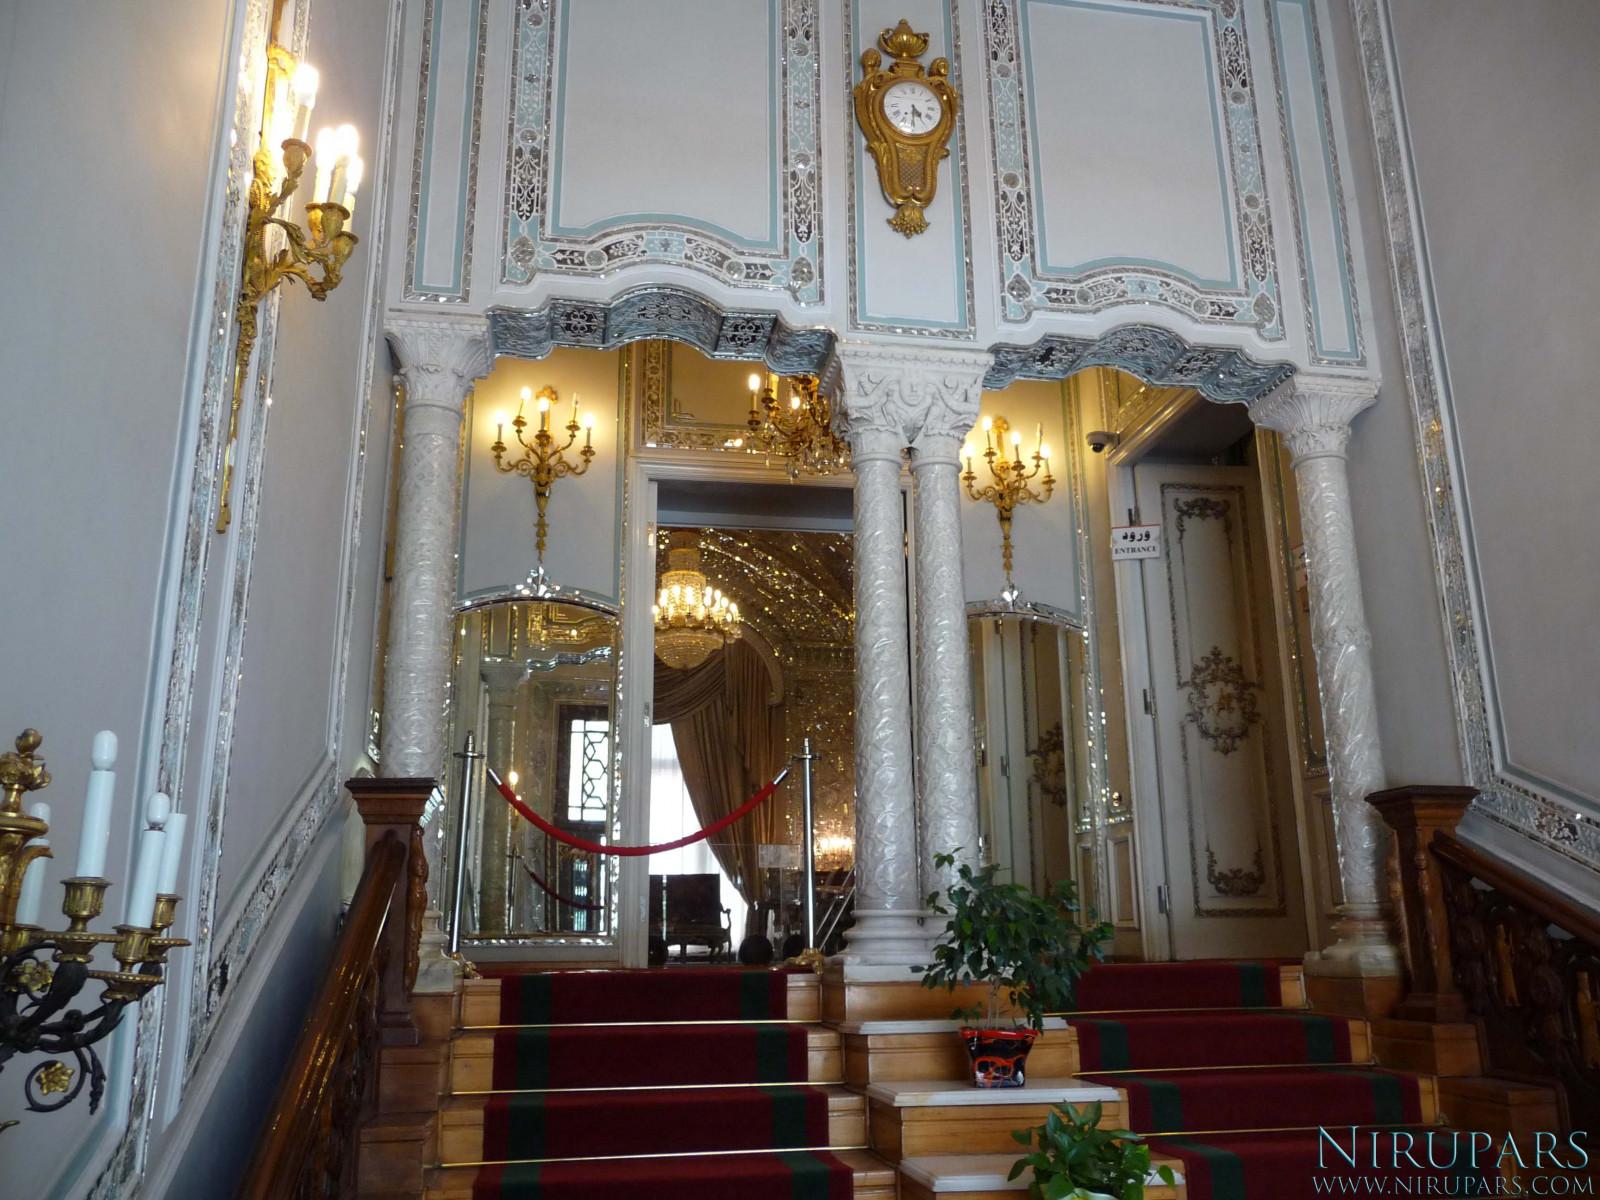 Sadabad Palace Complex - Green Palace - Audience Hall - Entrance